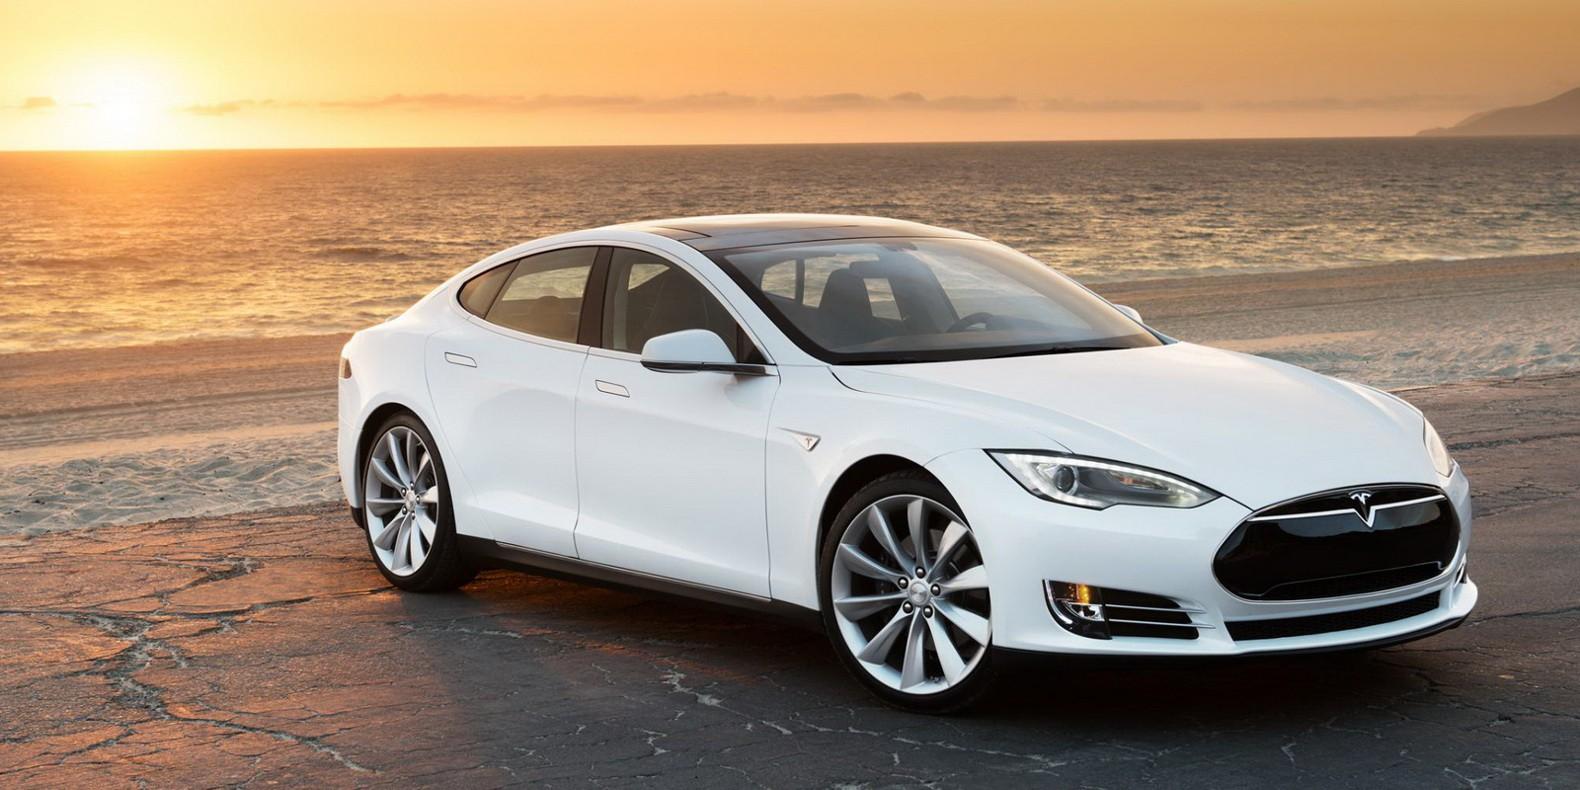 2015-Tesla-Model-S-P85D-consumer-reports-score